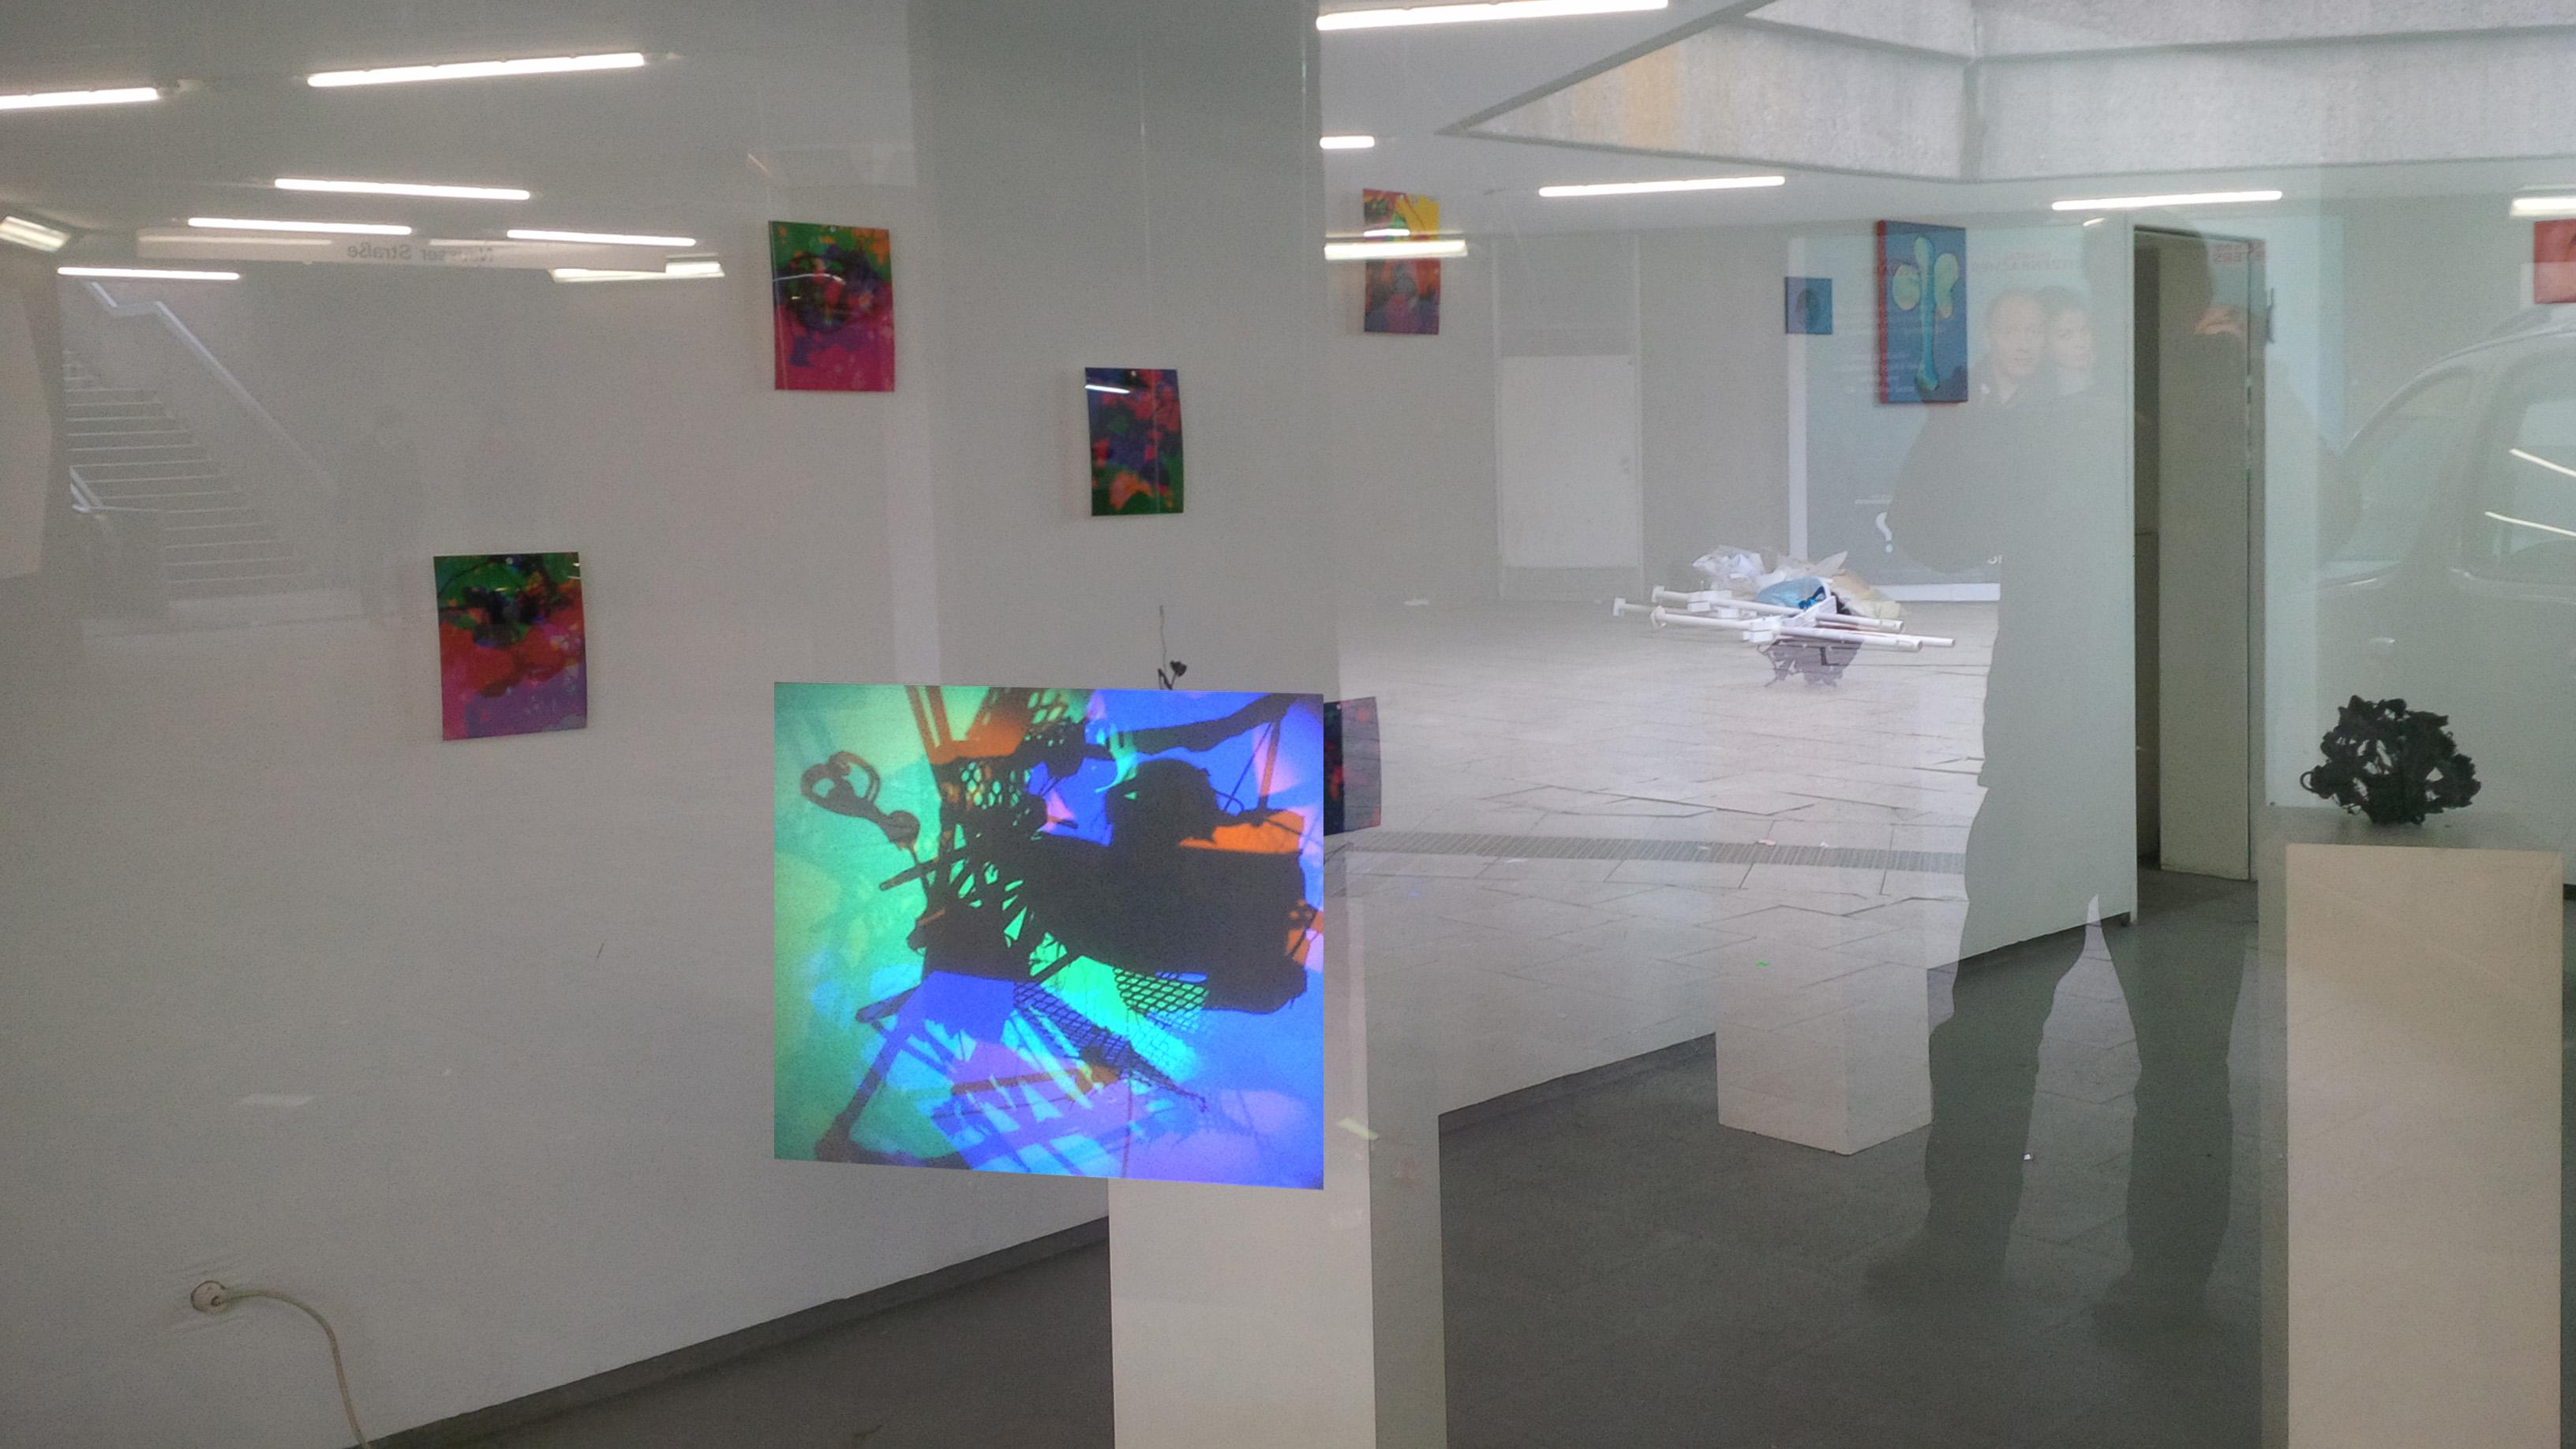 Souterrain | Bernd Fox, R.J.Kirsch und Adi Meier-Grolman